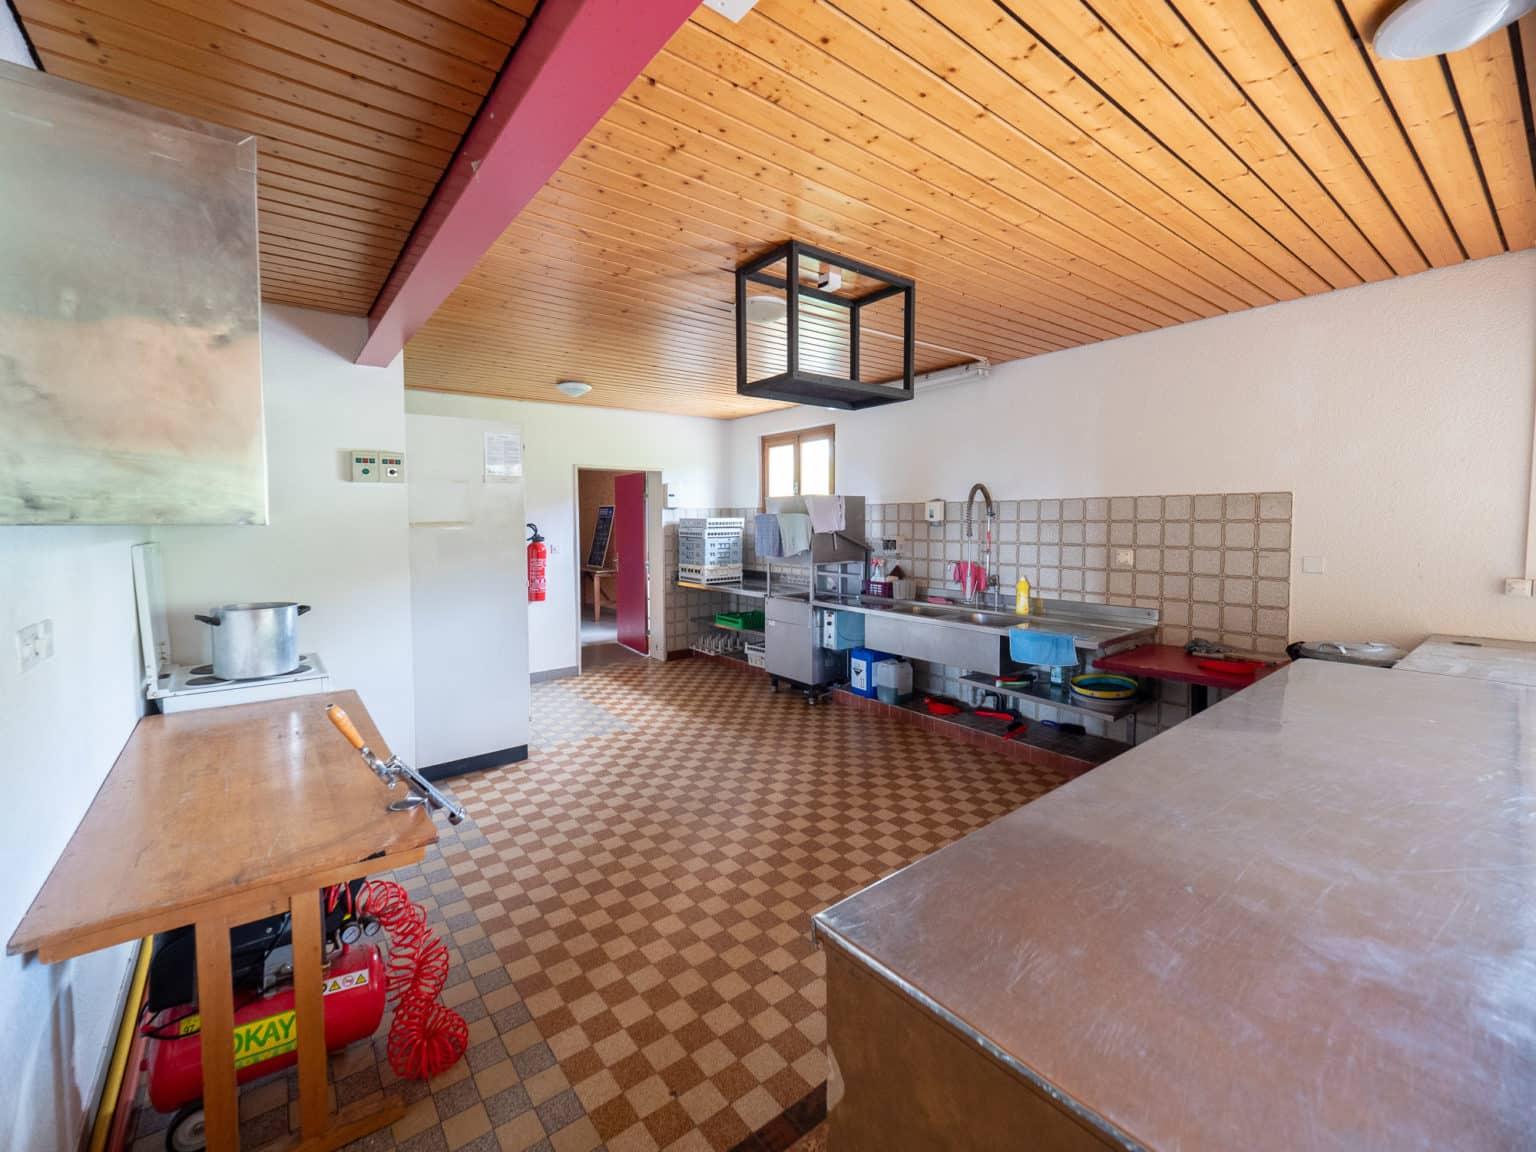 Refuges-salles-Montanaire©V-Dubach-52739